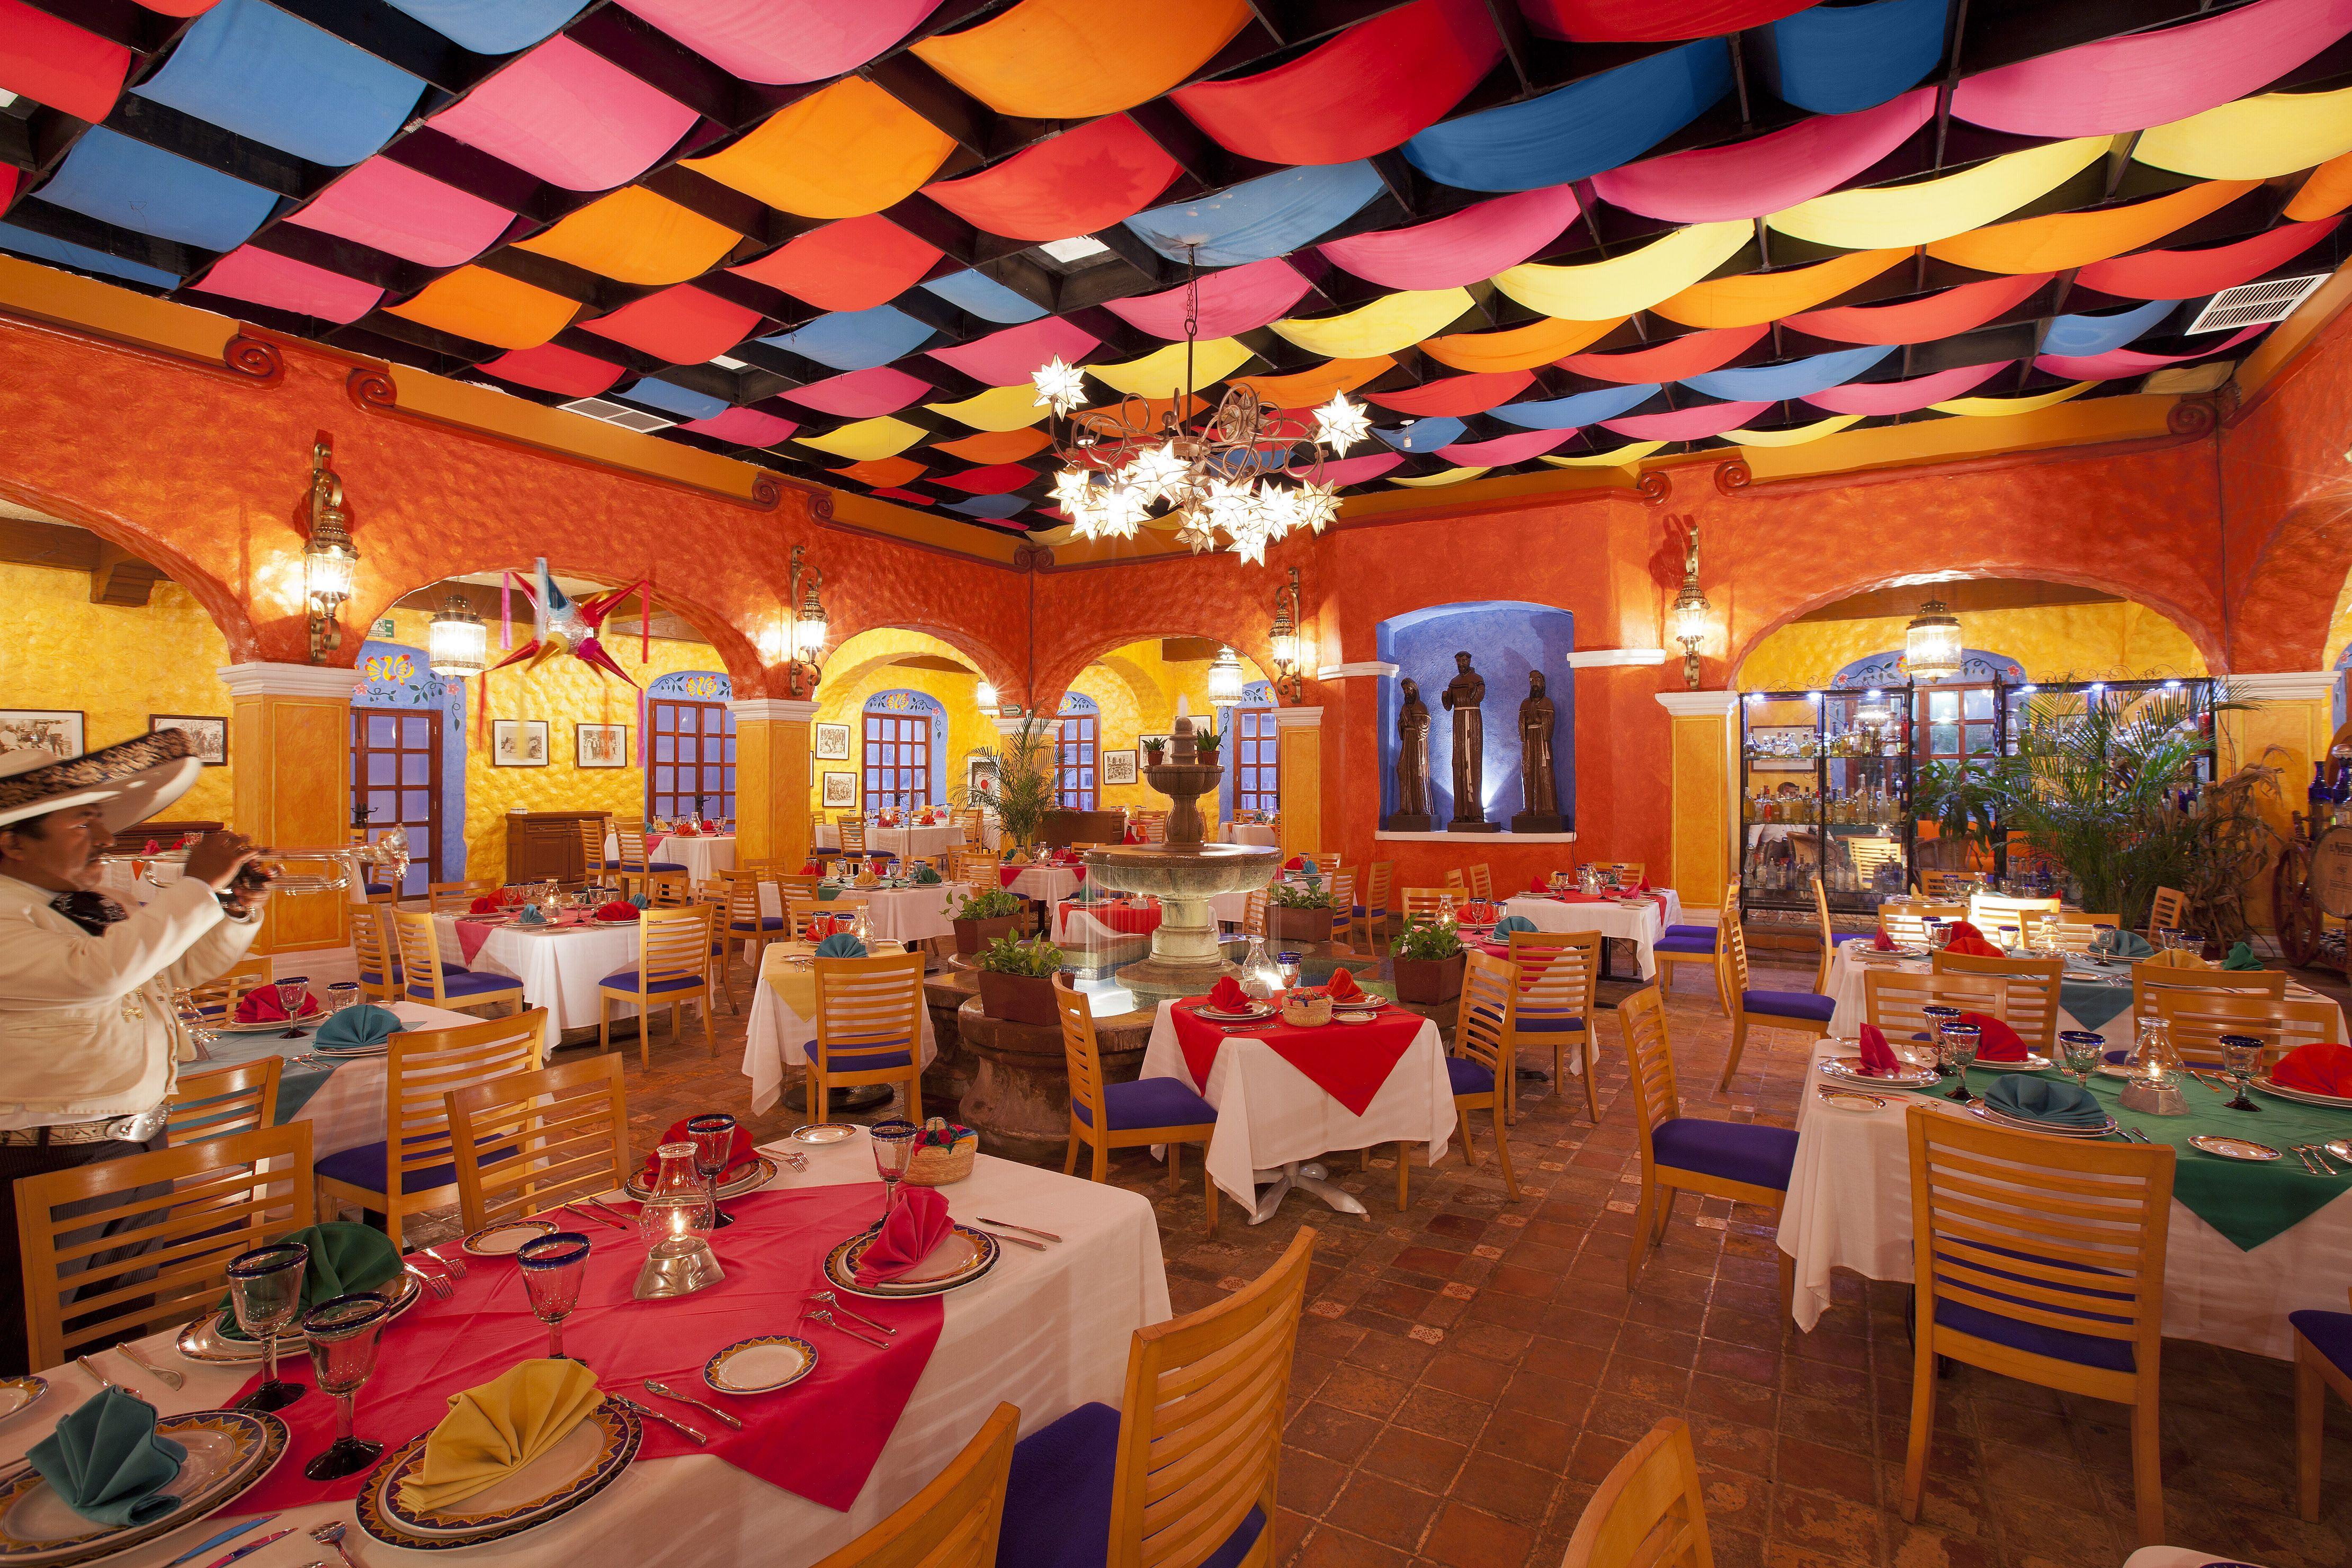 Restaurant Decor Mexican : Mexican restaurant alison viejo ca … decor mexic…